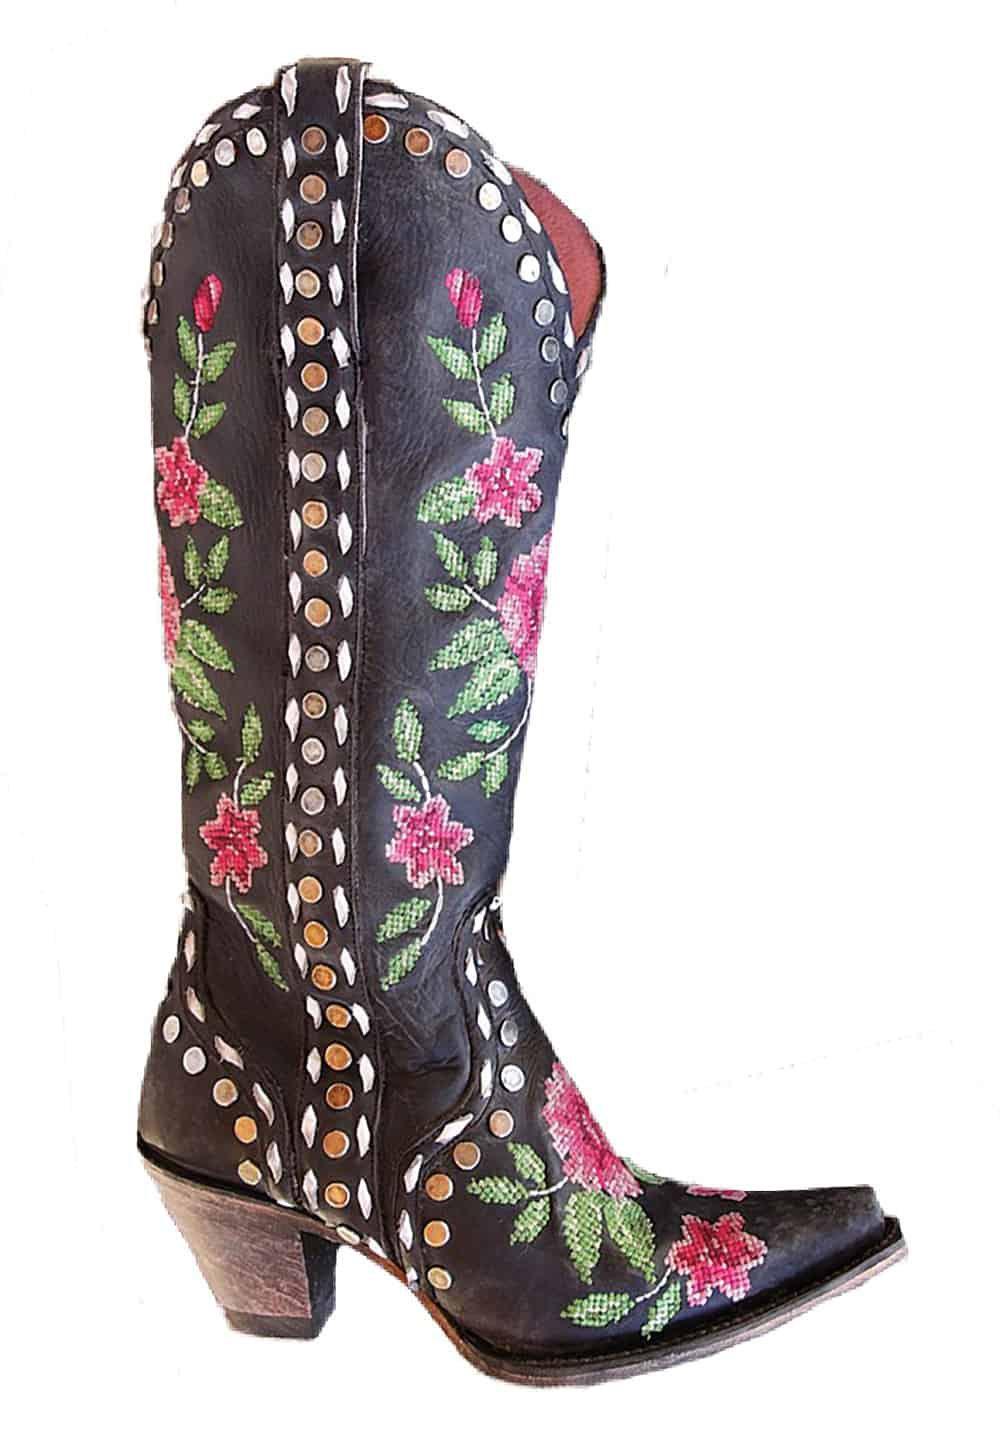 junk gypsy boots cowgirl magazine